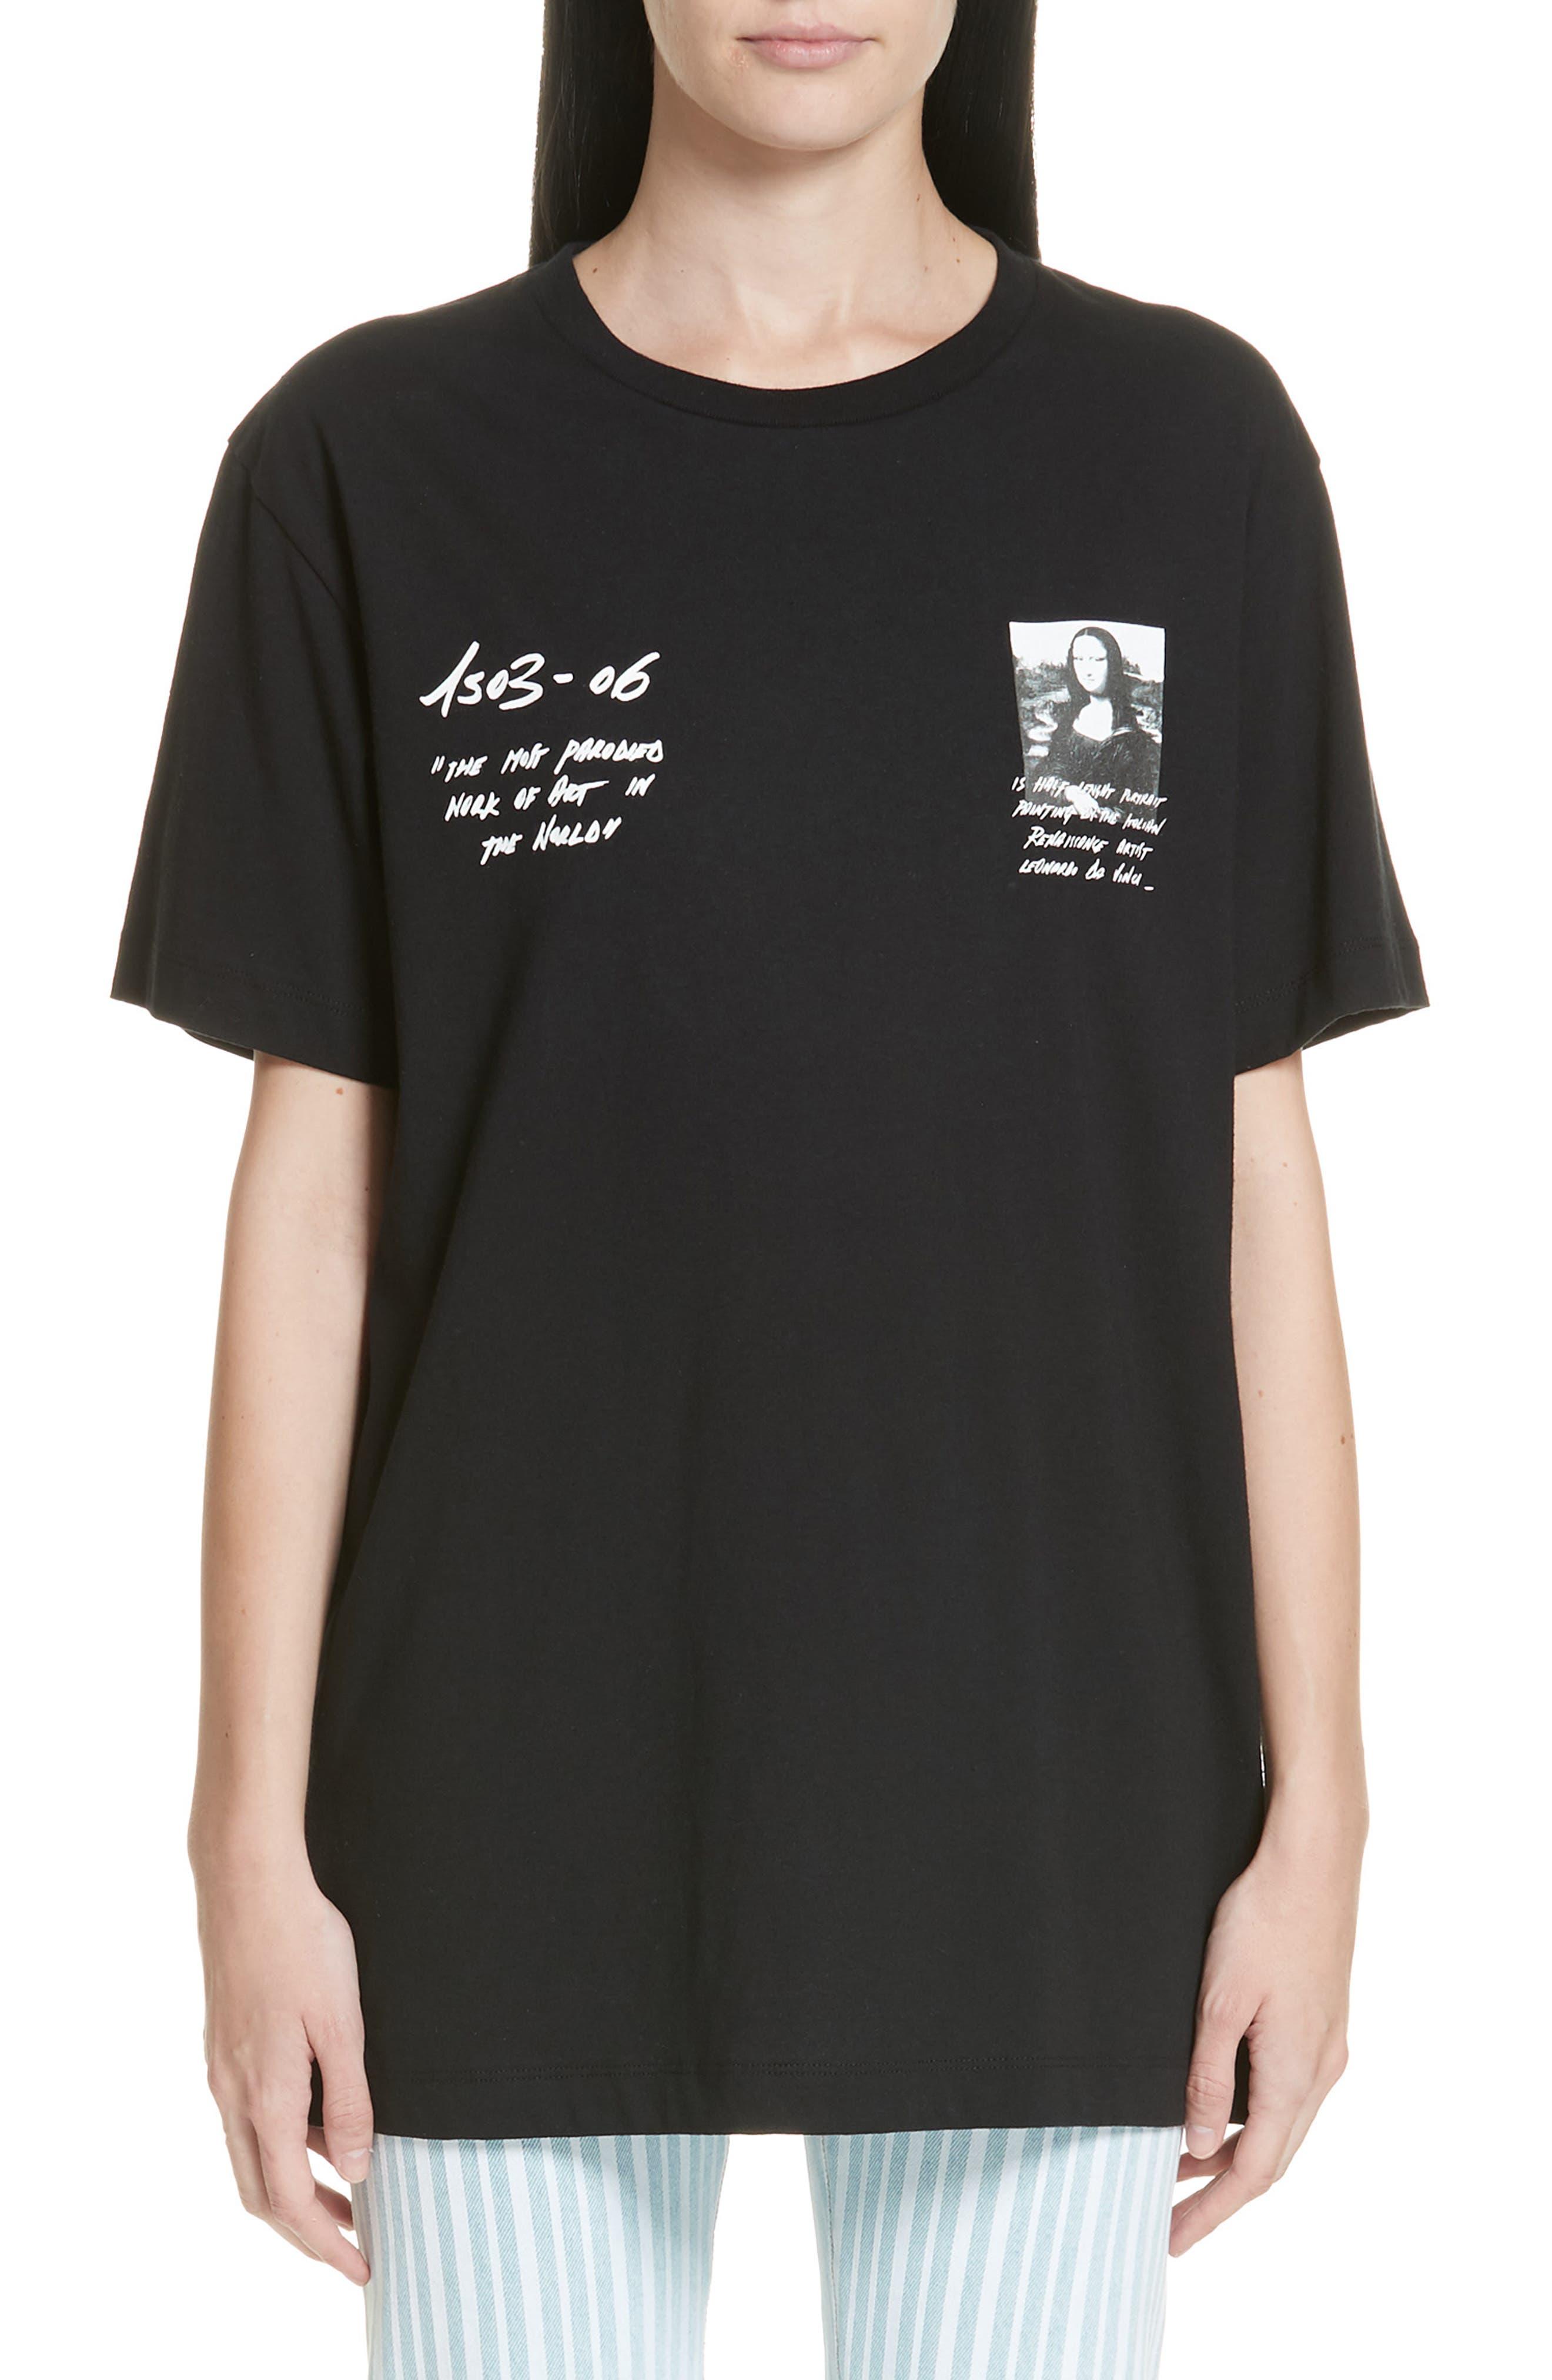 OFF-WHITE Mona Lisa Sign Short Sleeve Slim Tee, Main, color, BLACK RED